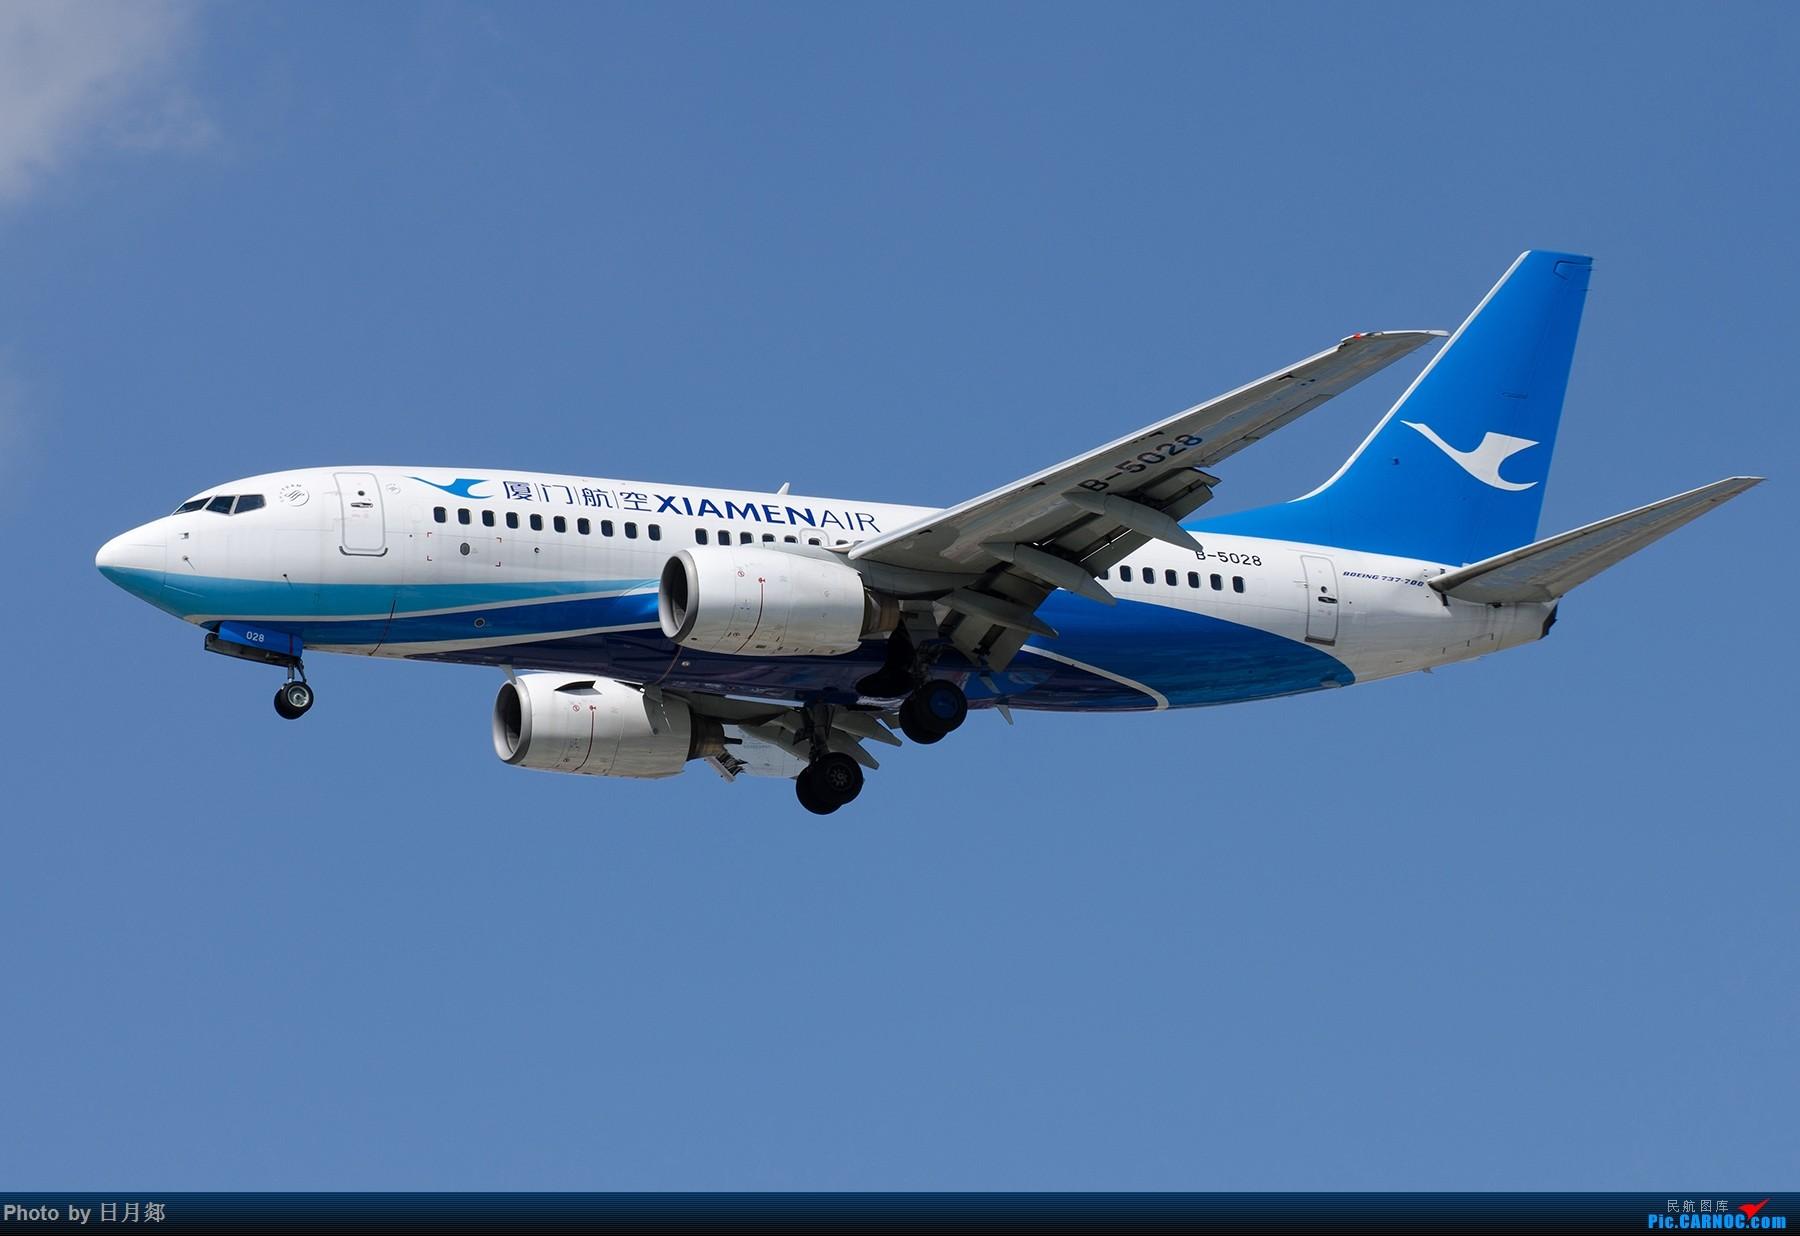 Re:[原创]【SHA拍机*1800大图】国庆的存货接着发,台风啥时候才能过去 BOEING 737-700 B-5028 中国上海虹桥国际机场